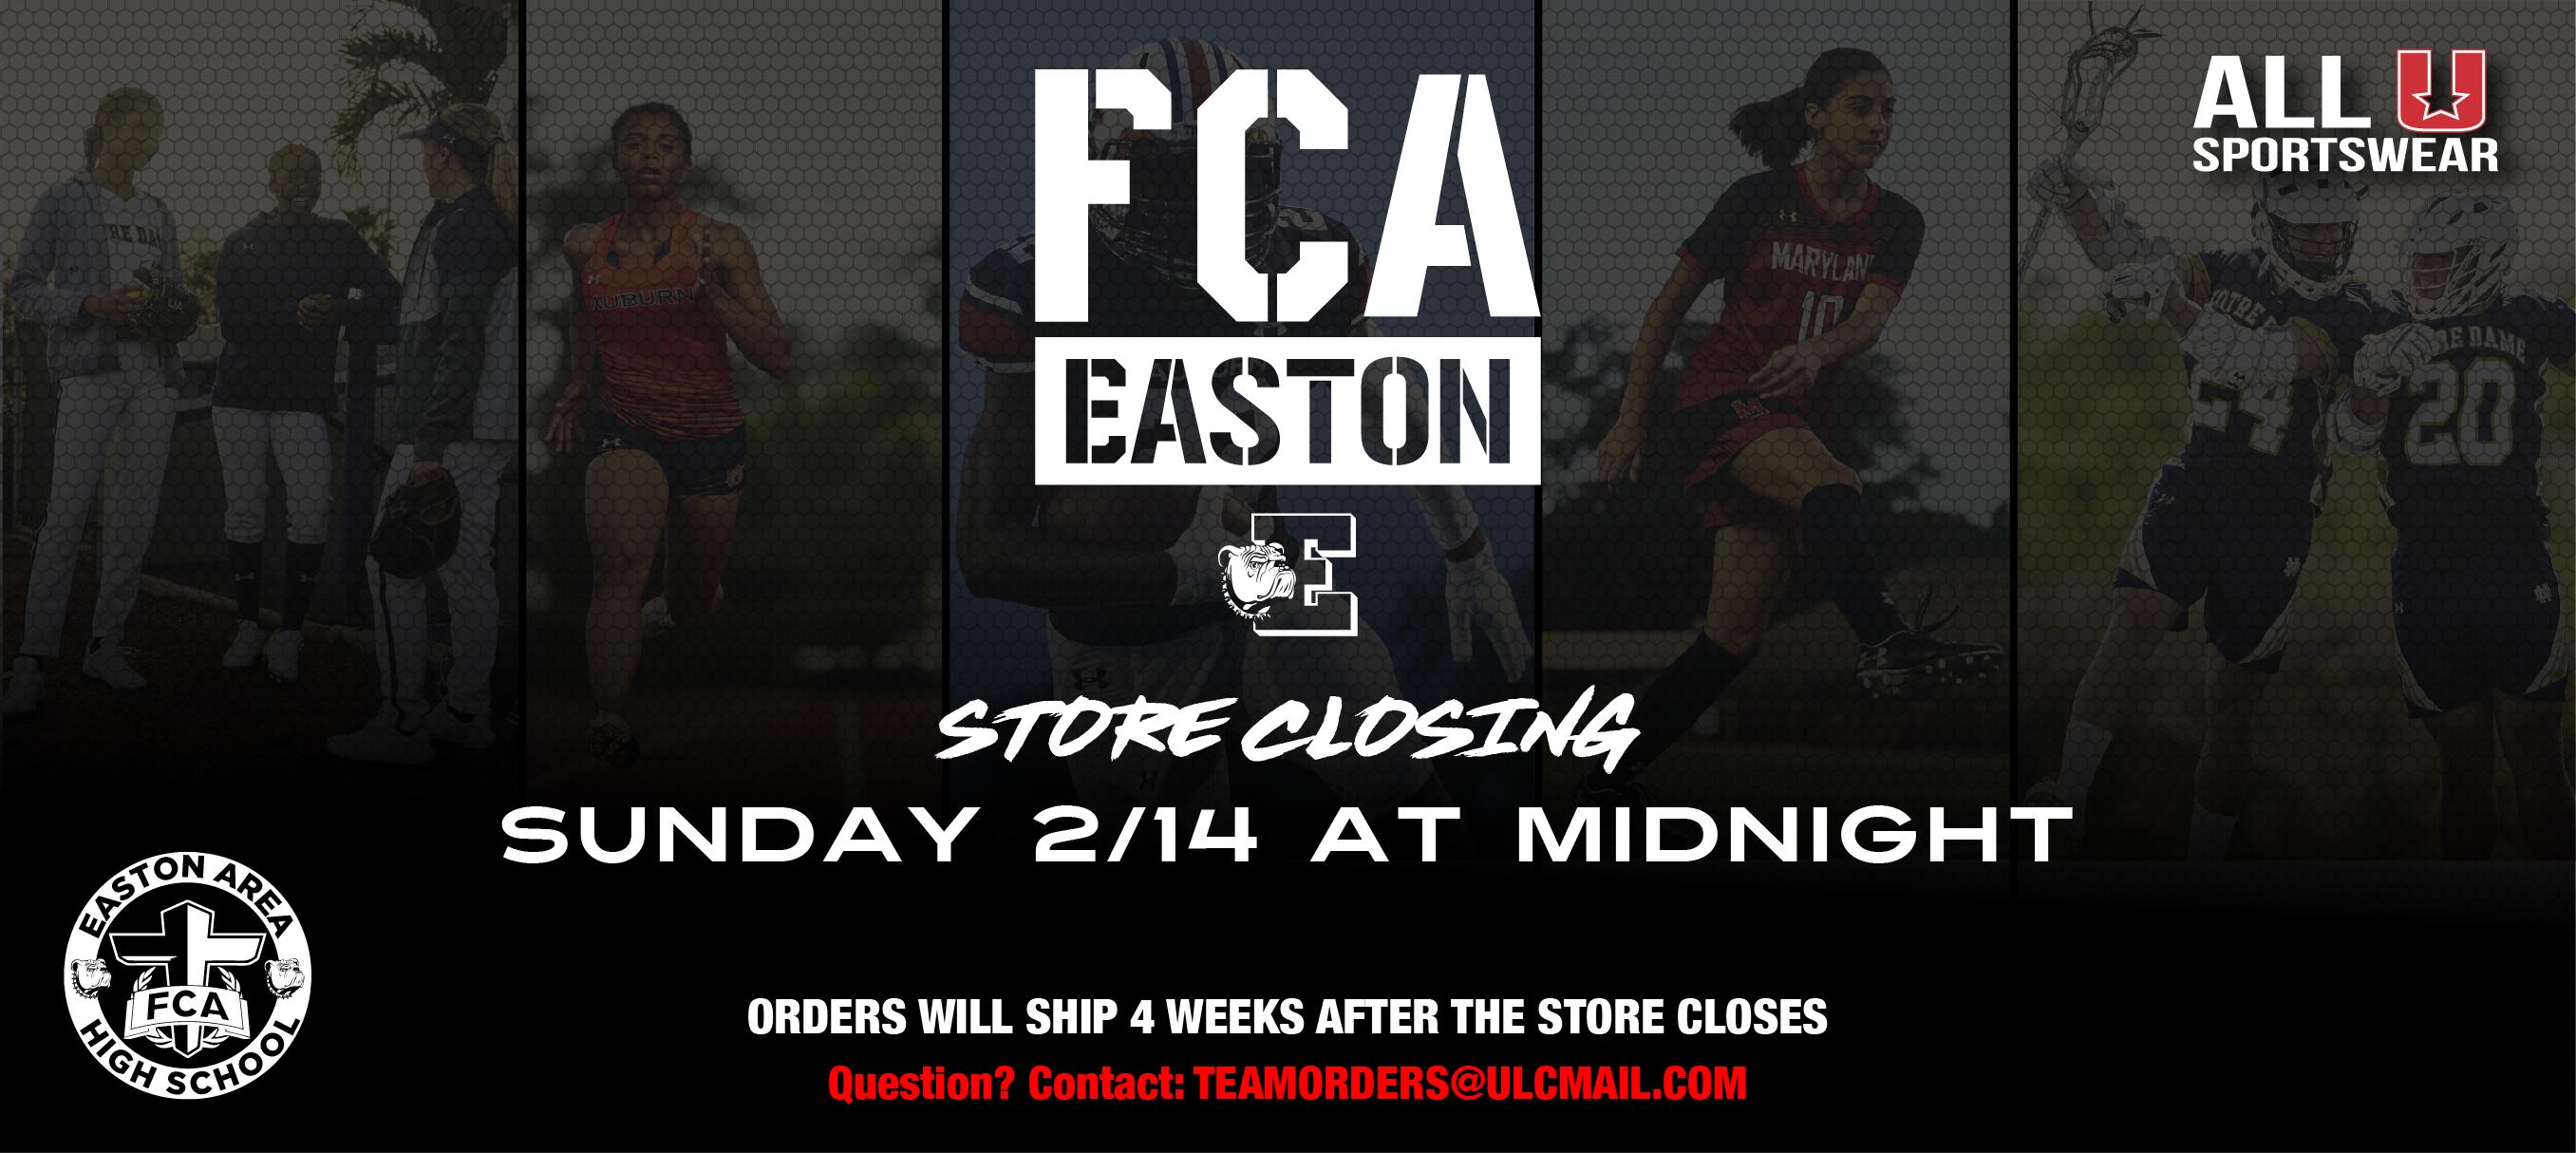 FCA Easton